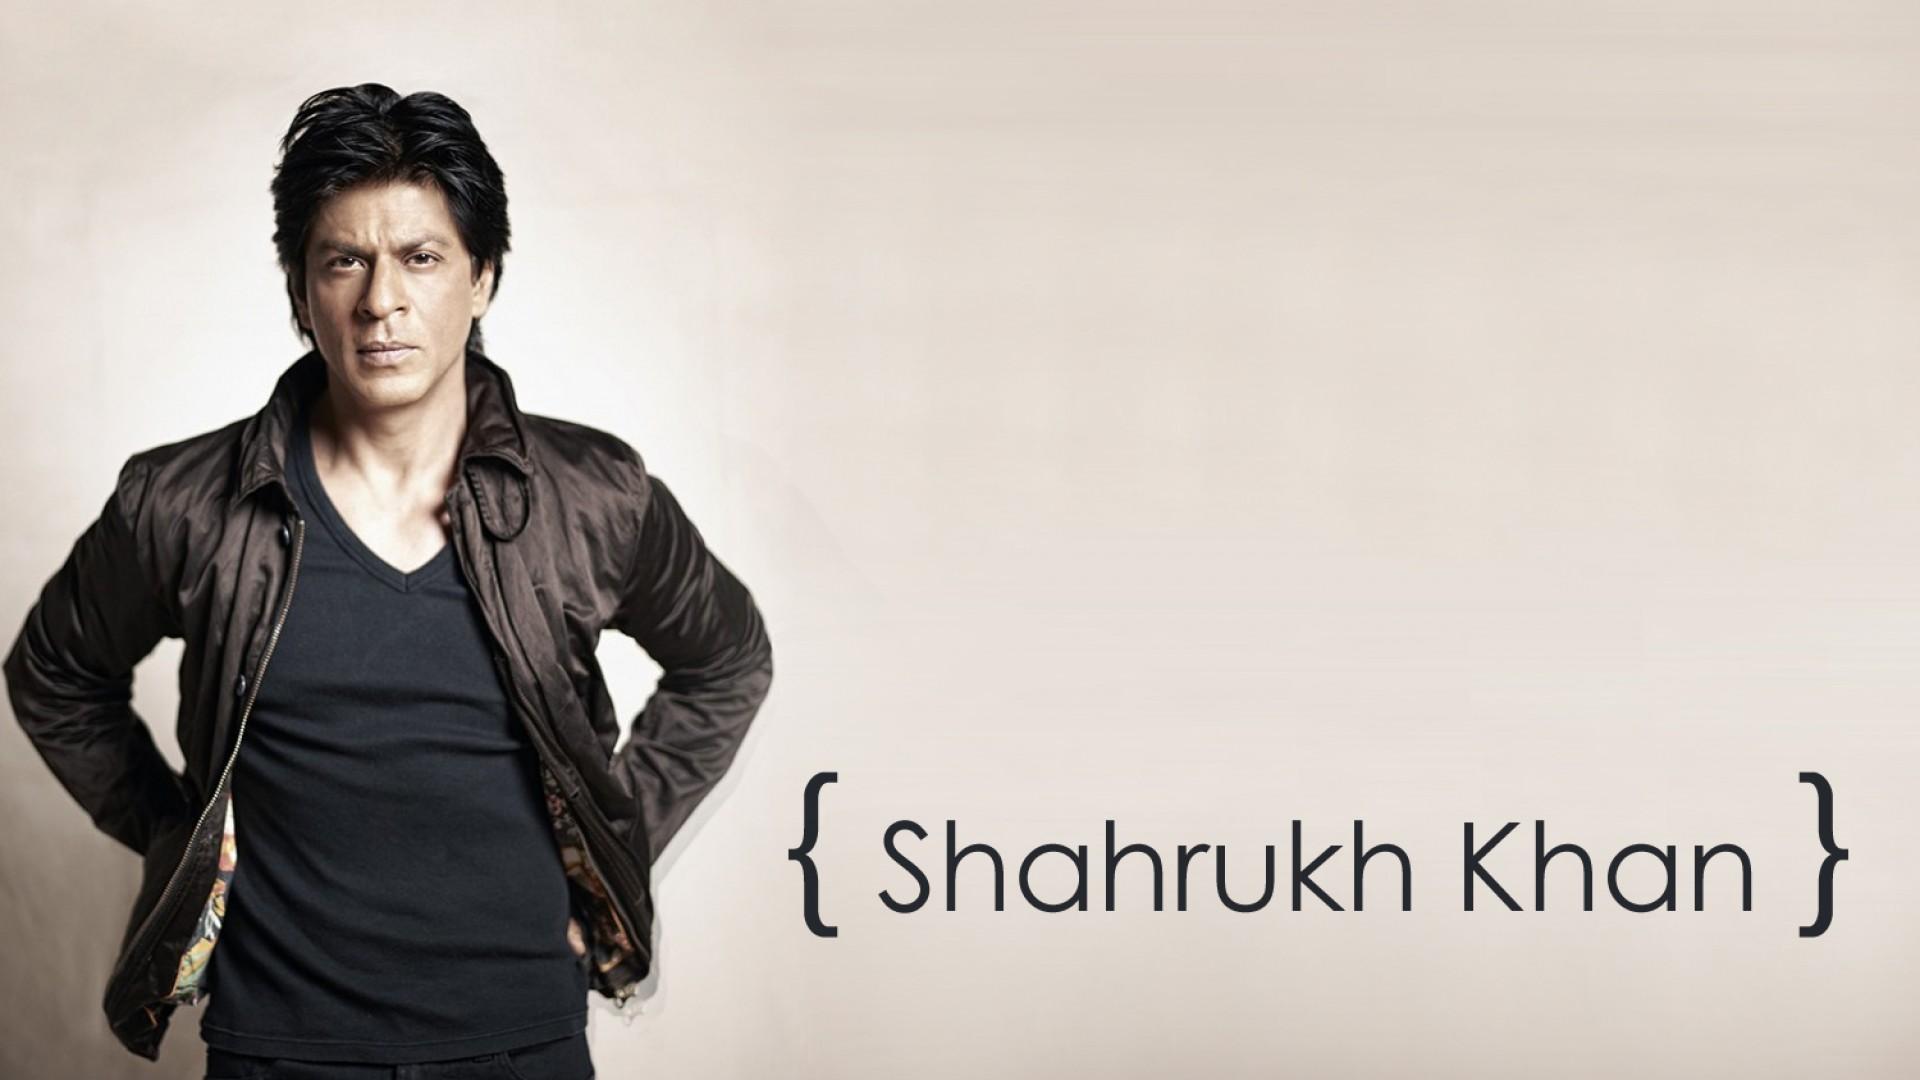 Shah Rukh Khan HD Wallpapers • PoPoPics.com